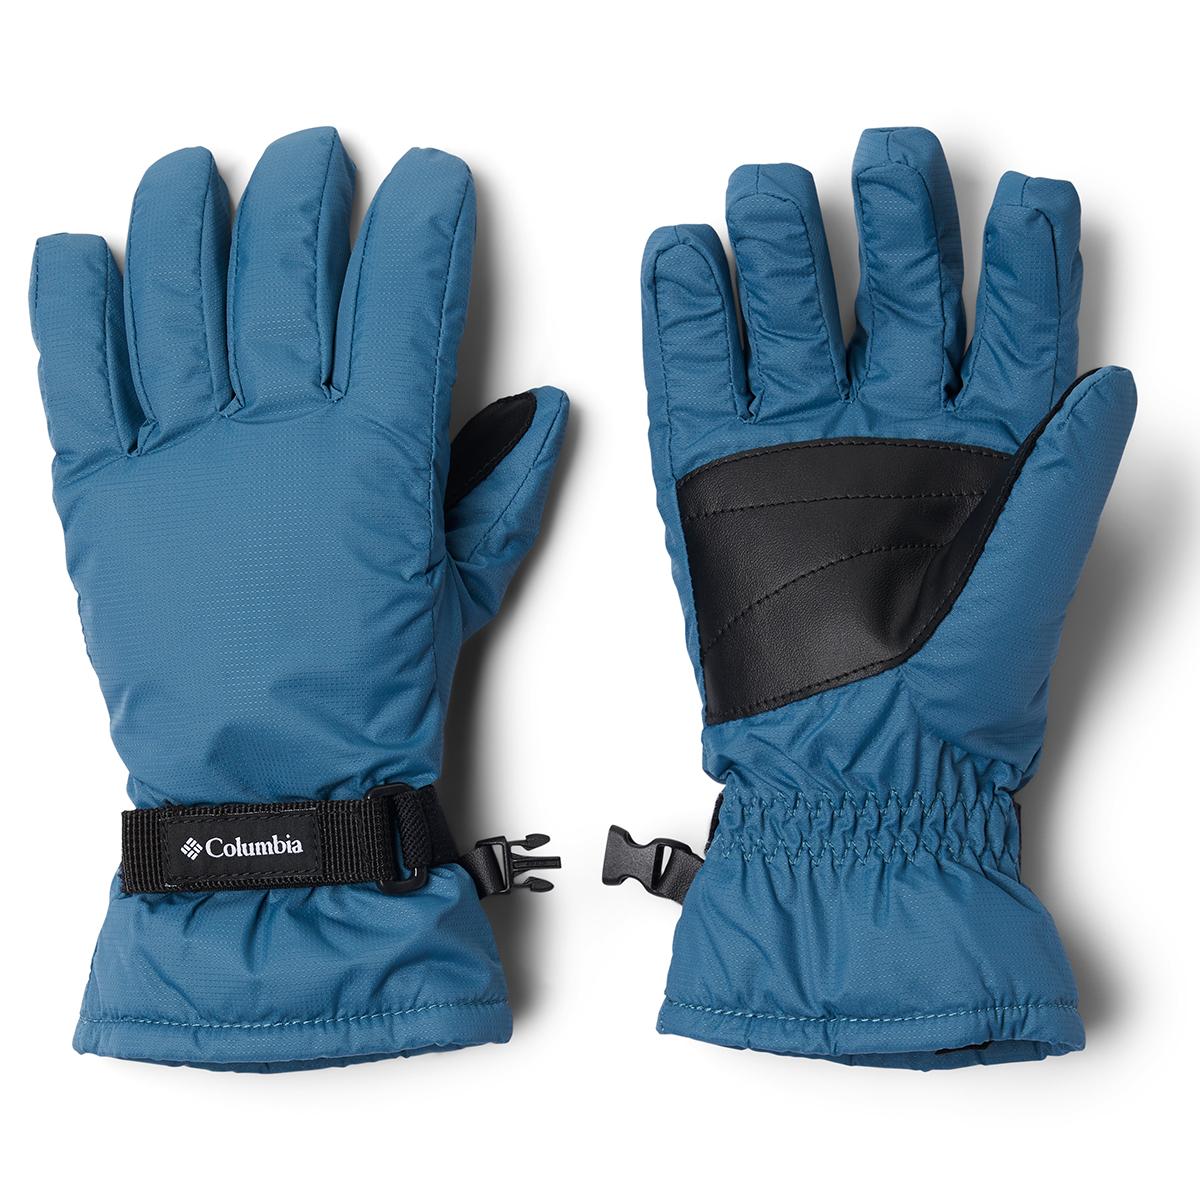 Columbia Kids' Core Gloves - Blue, XL